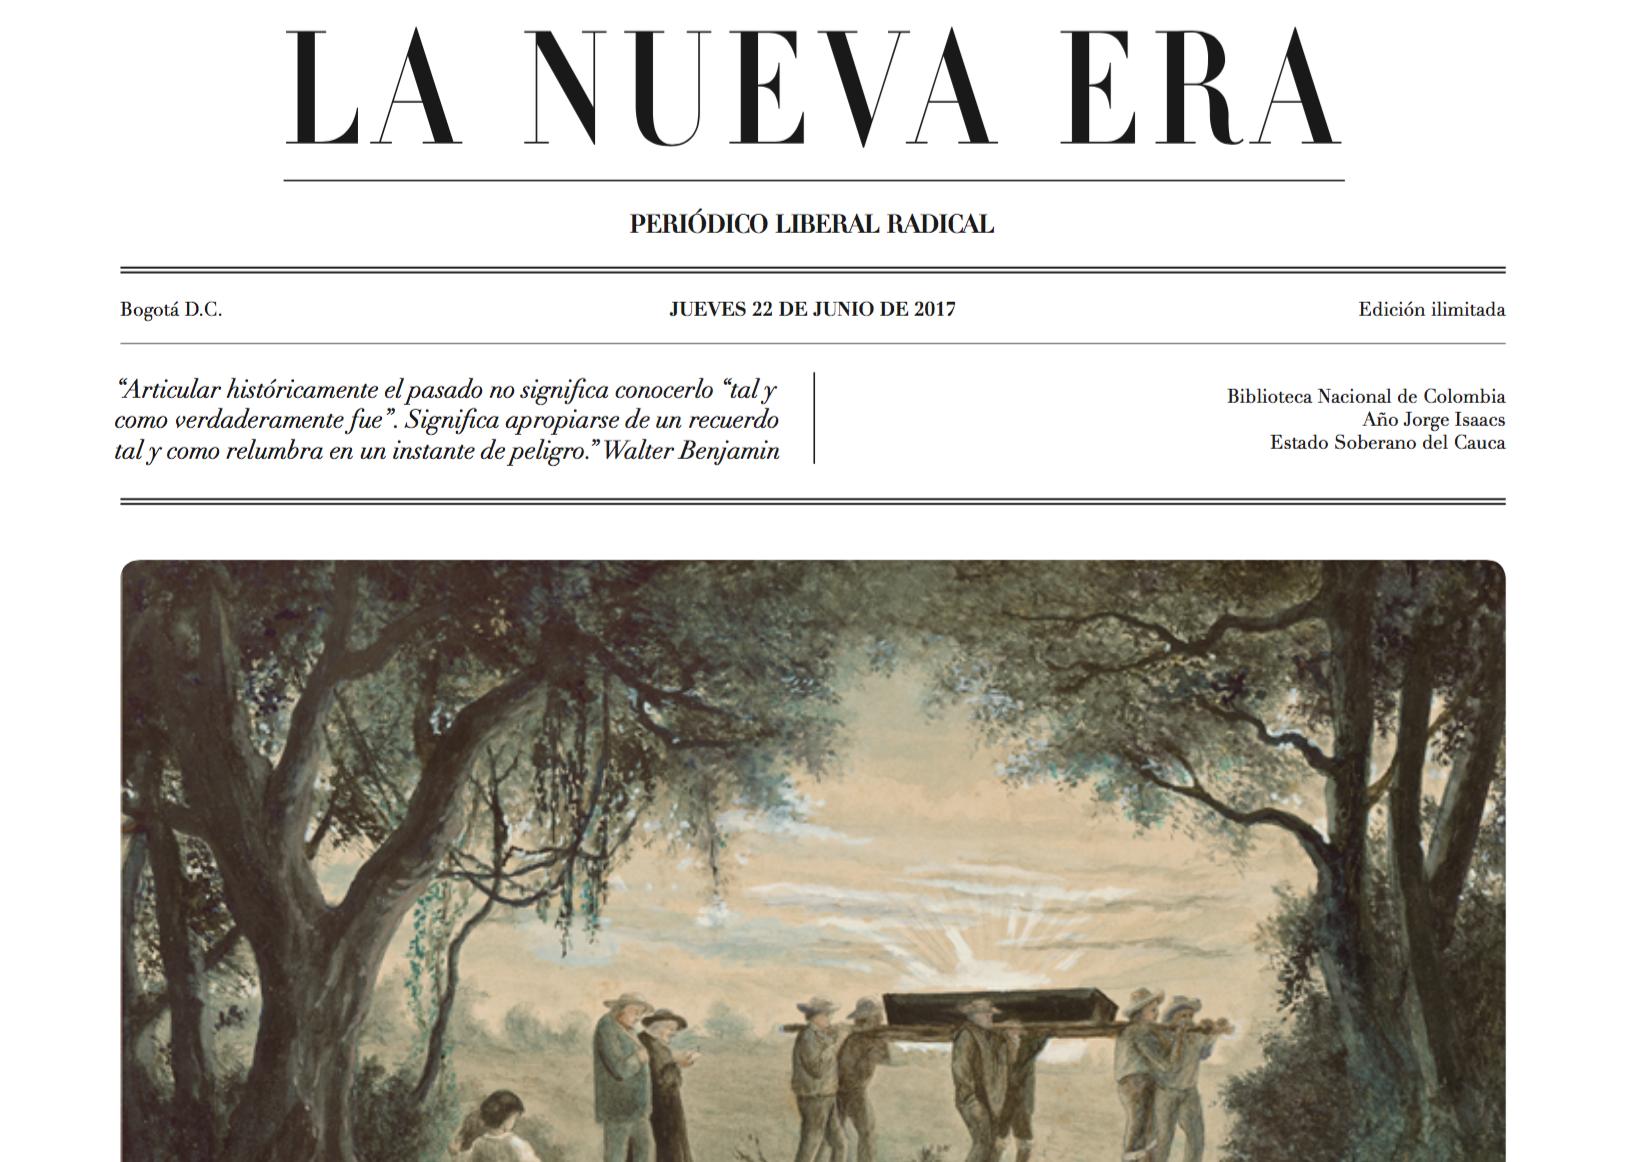 Diseño periódico — DANIEL SALAMANCA NÚÑEZ